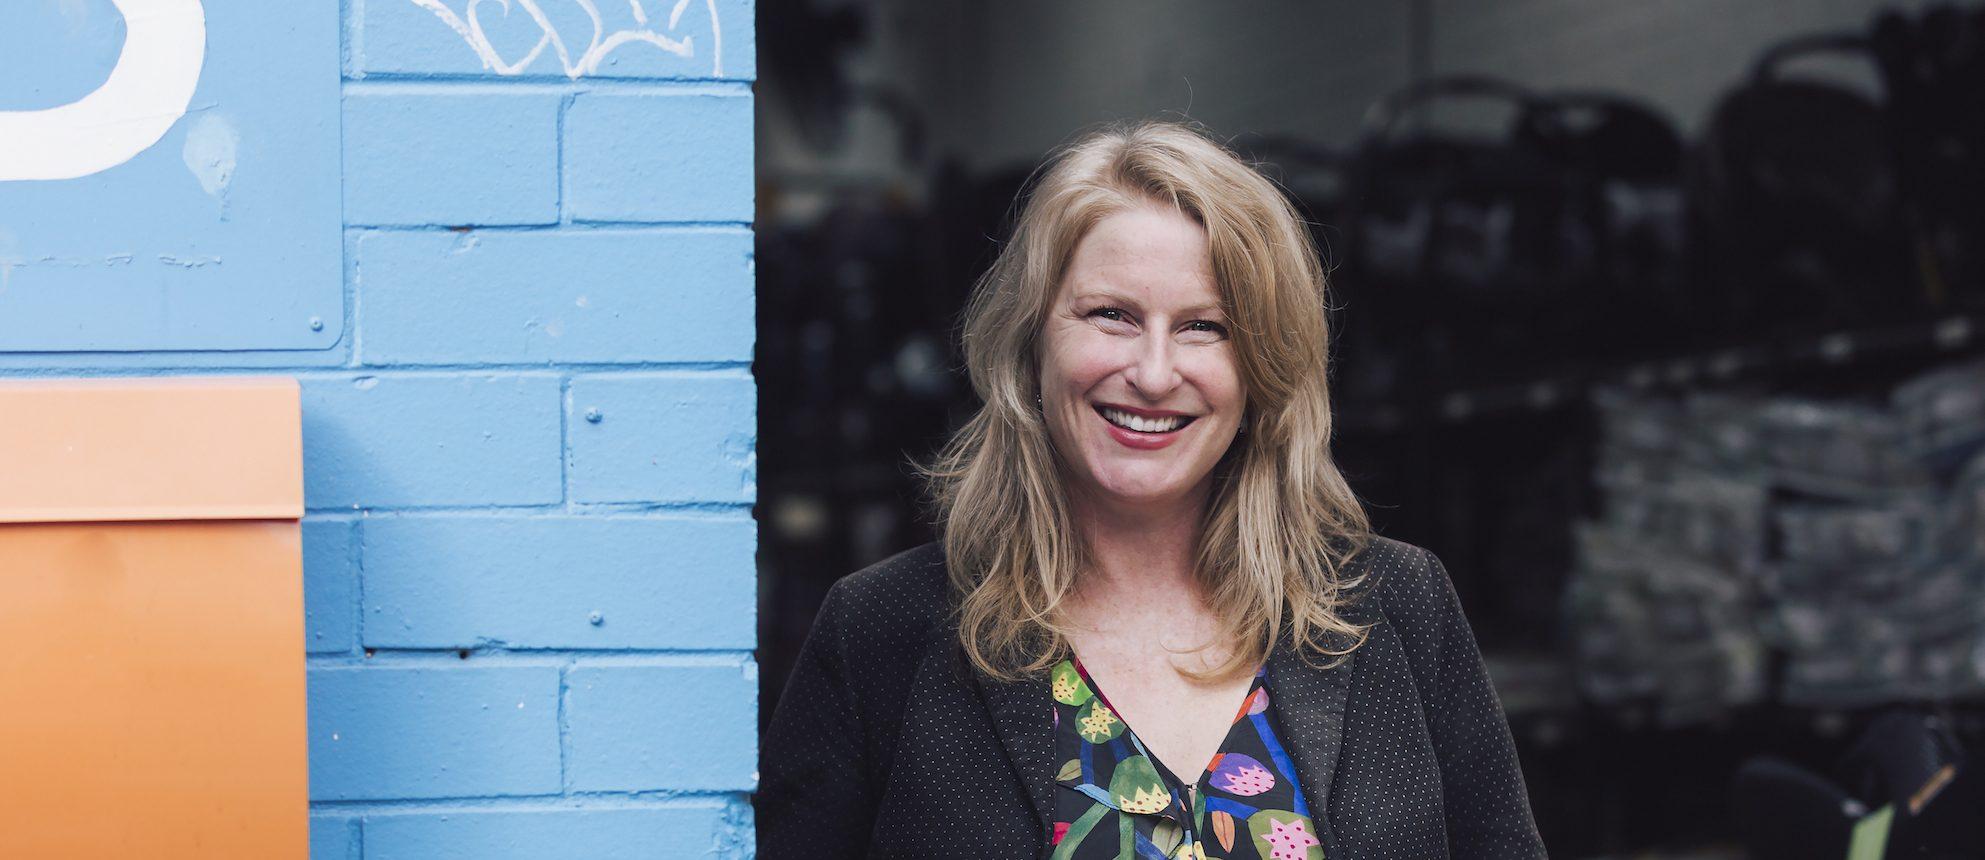 #LeadingLadies: Jessica Macpherson